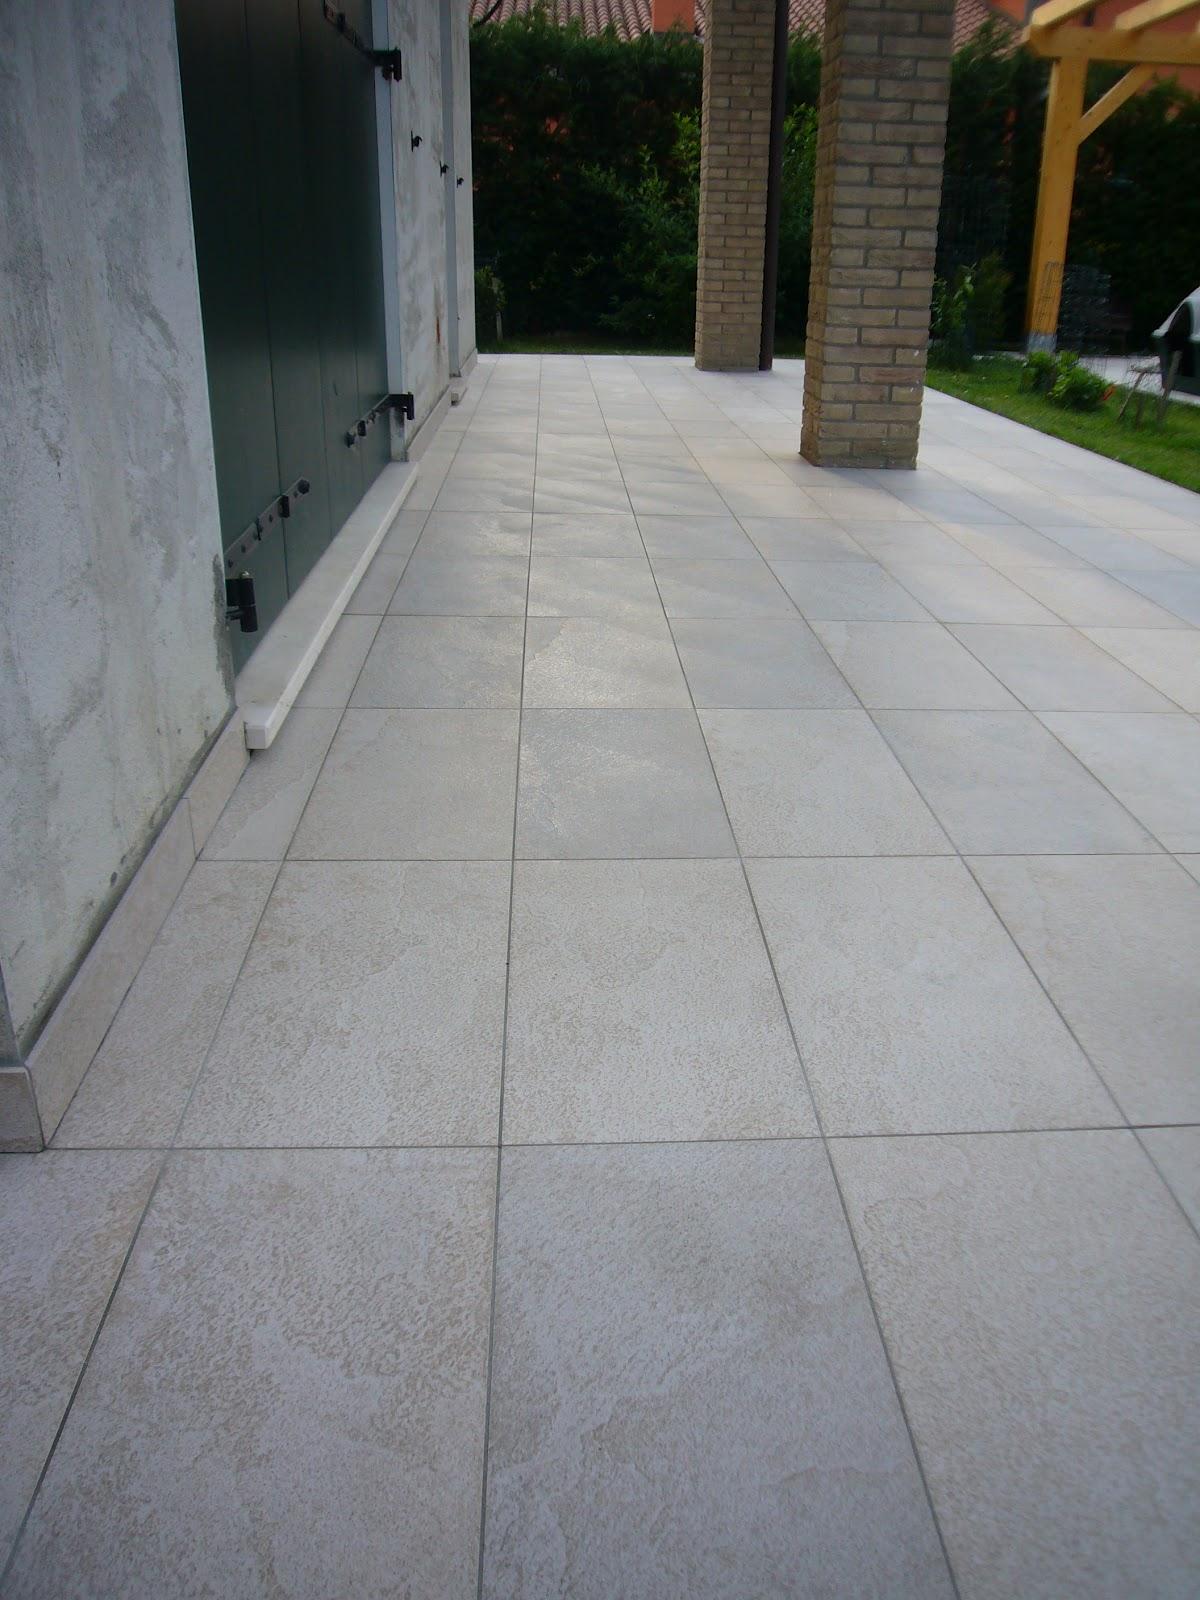 Pavimento esterno - Posa piastrelle esterno ...